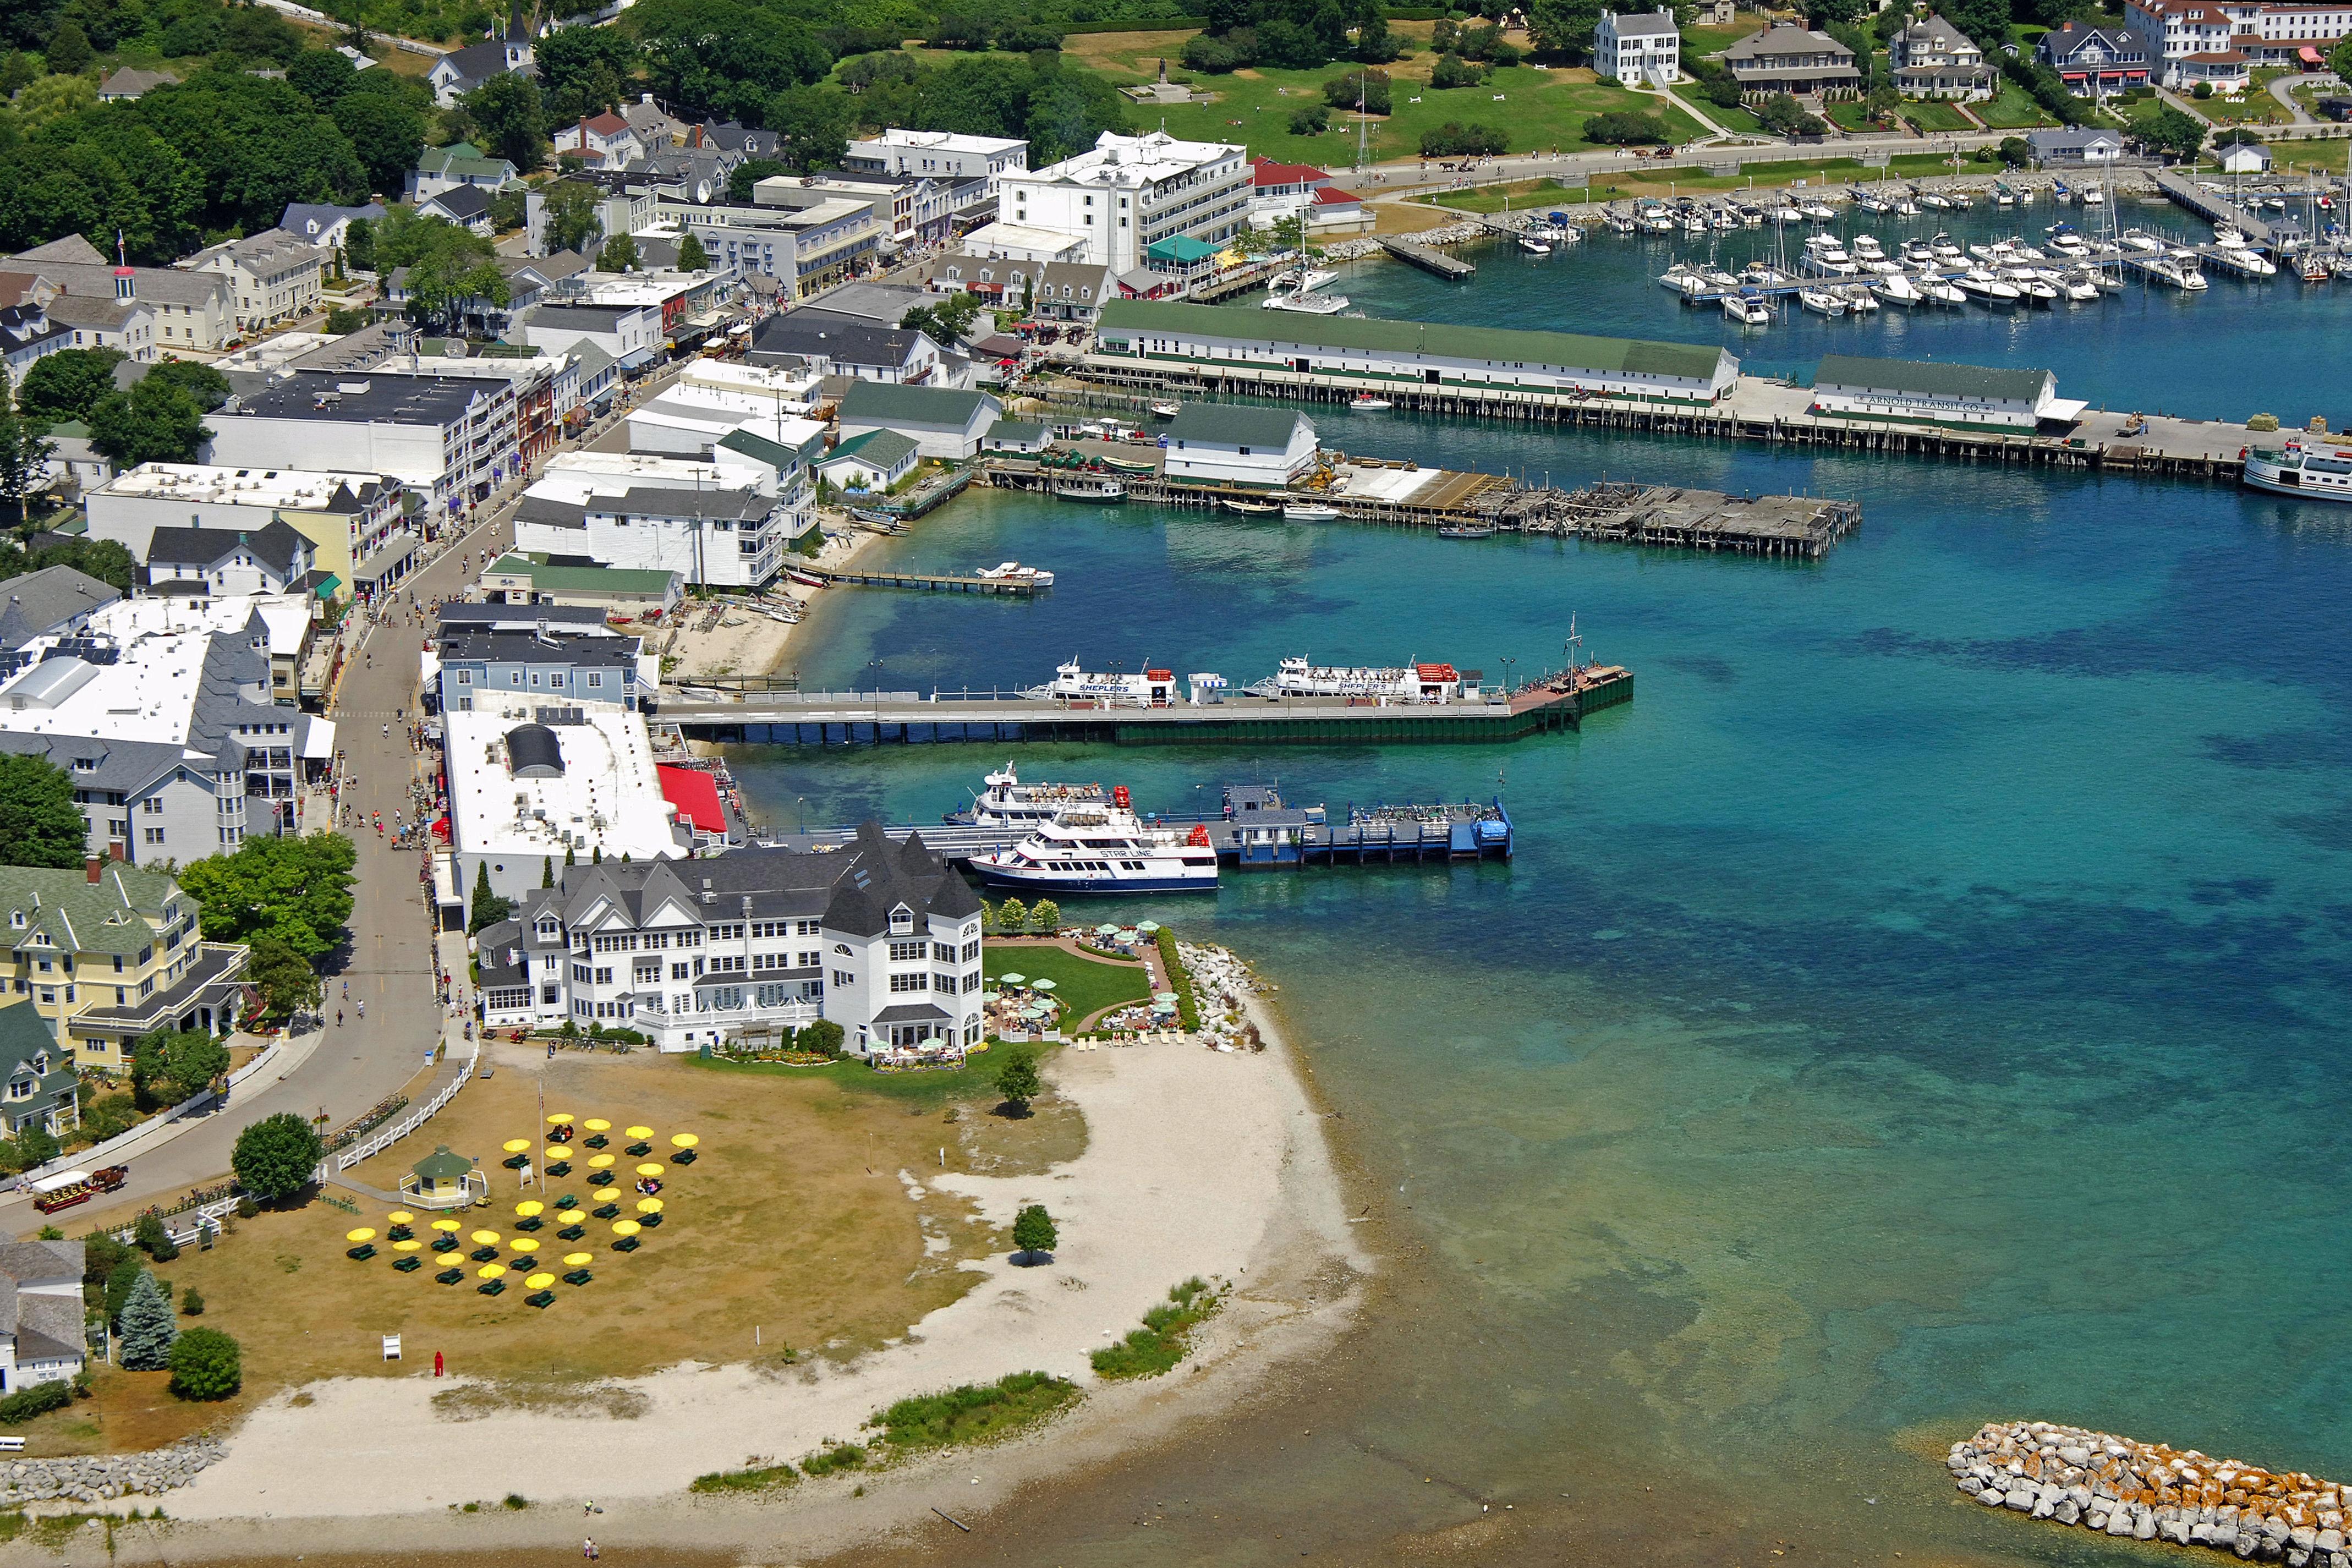 Mackinac Island City Marina